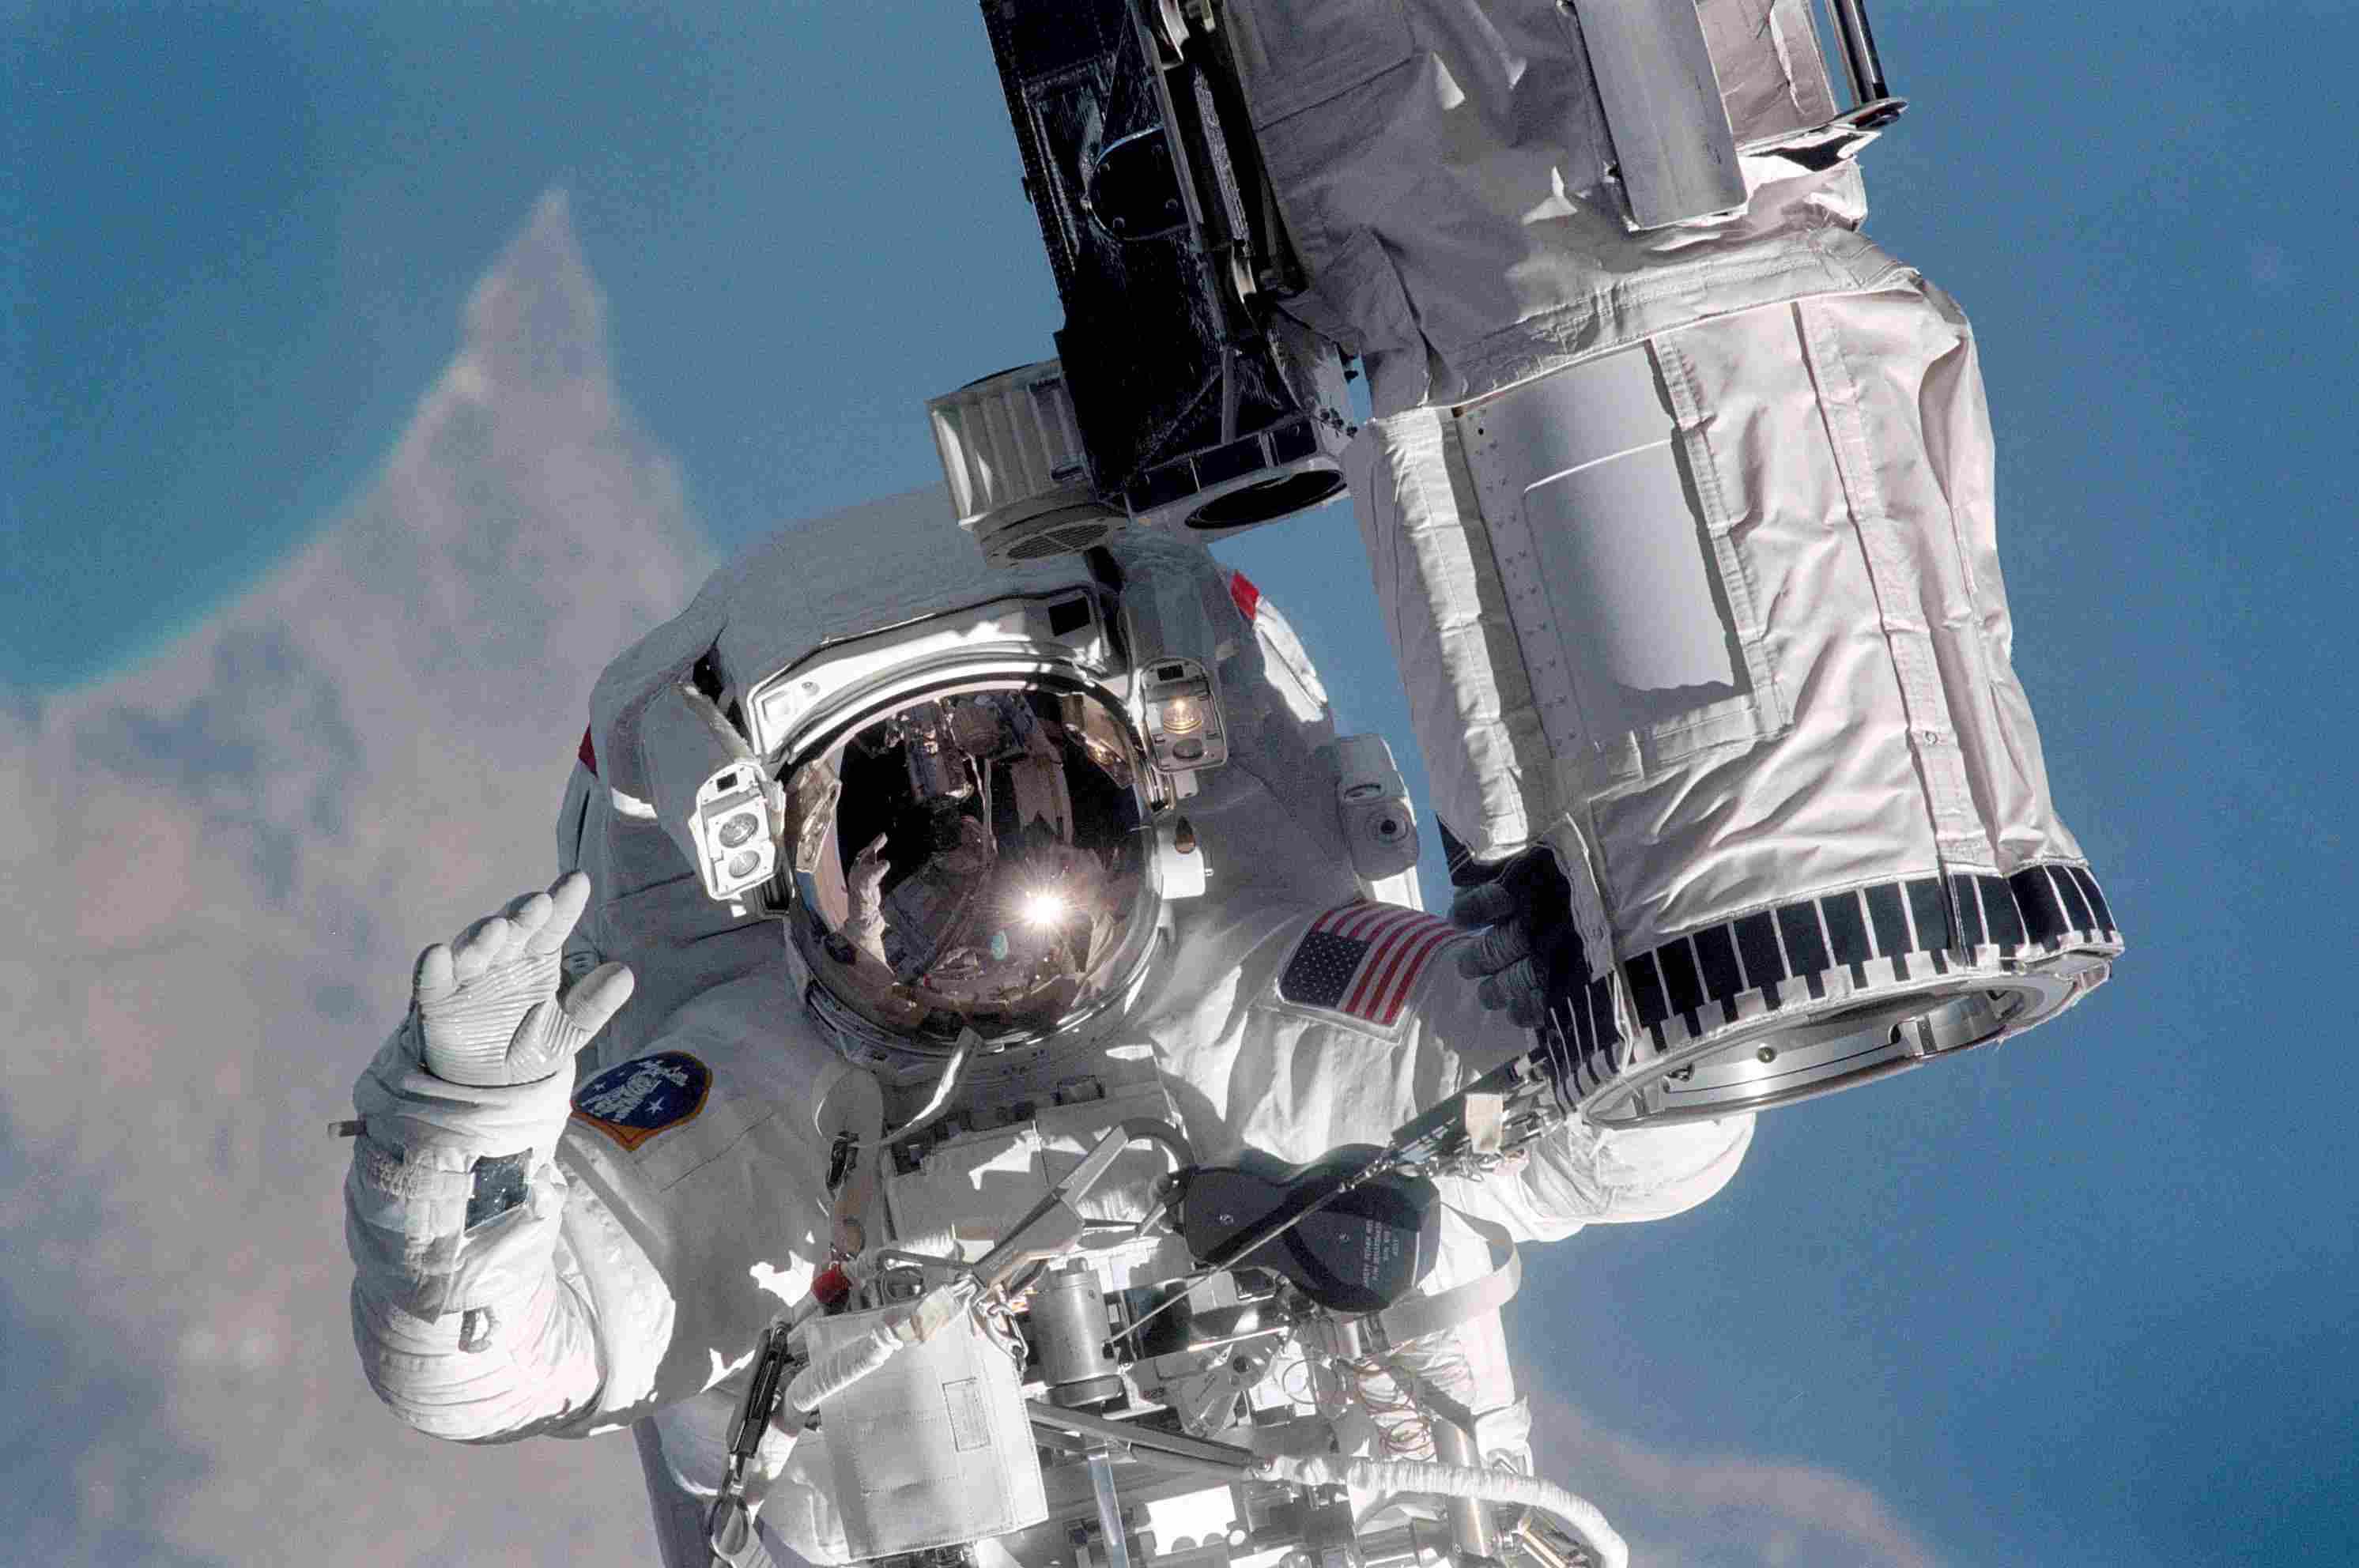 space_+station_nasa.jpg